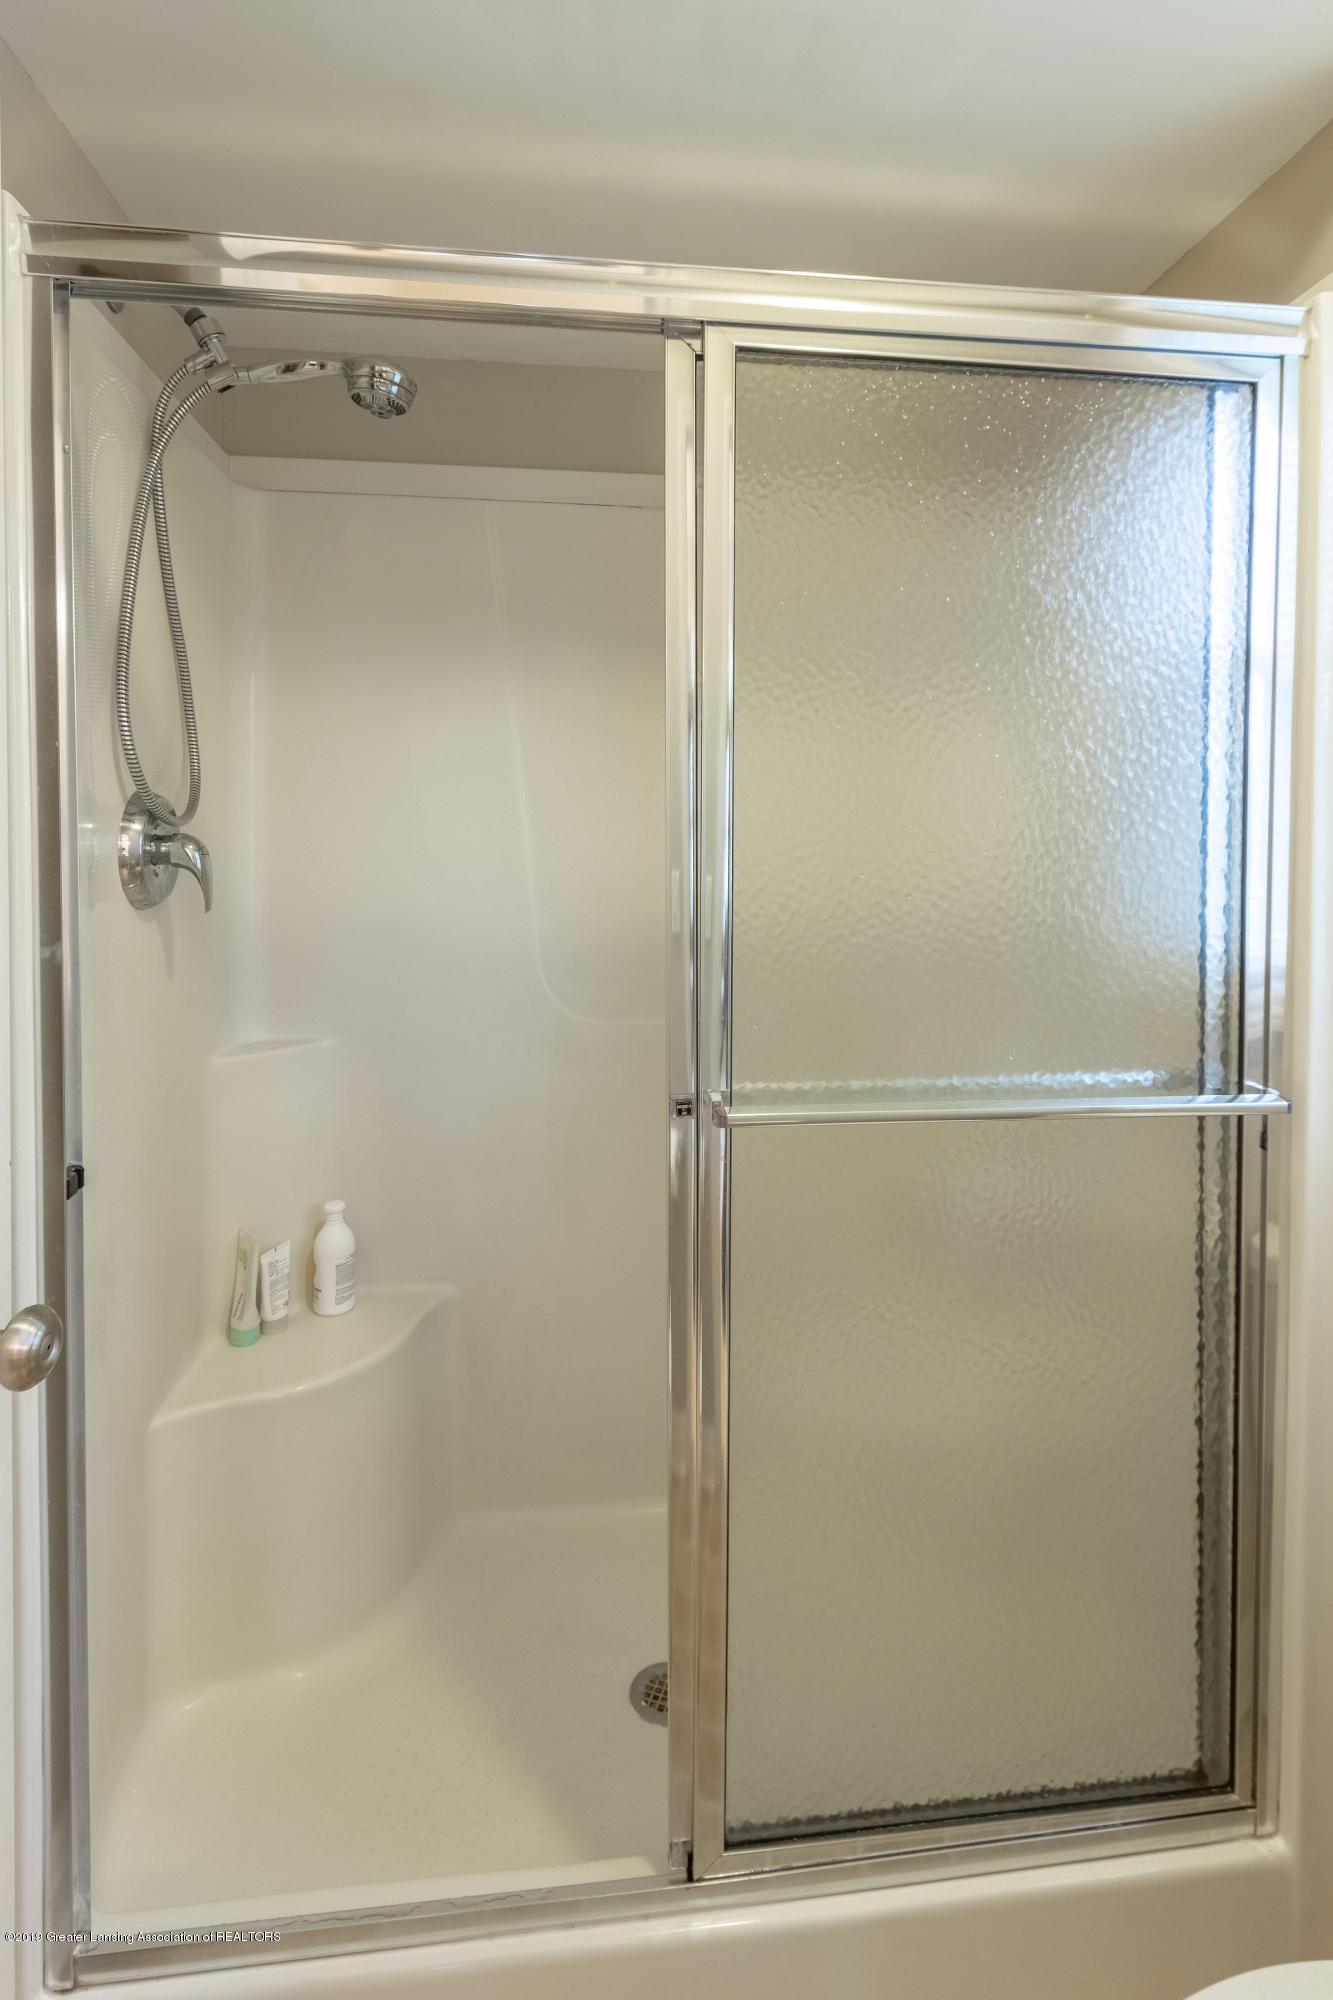 3585 W Arbutus Dr - Master Bathroom - 28